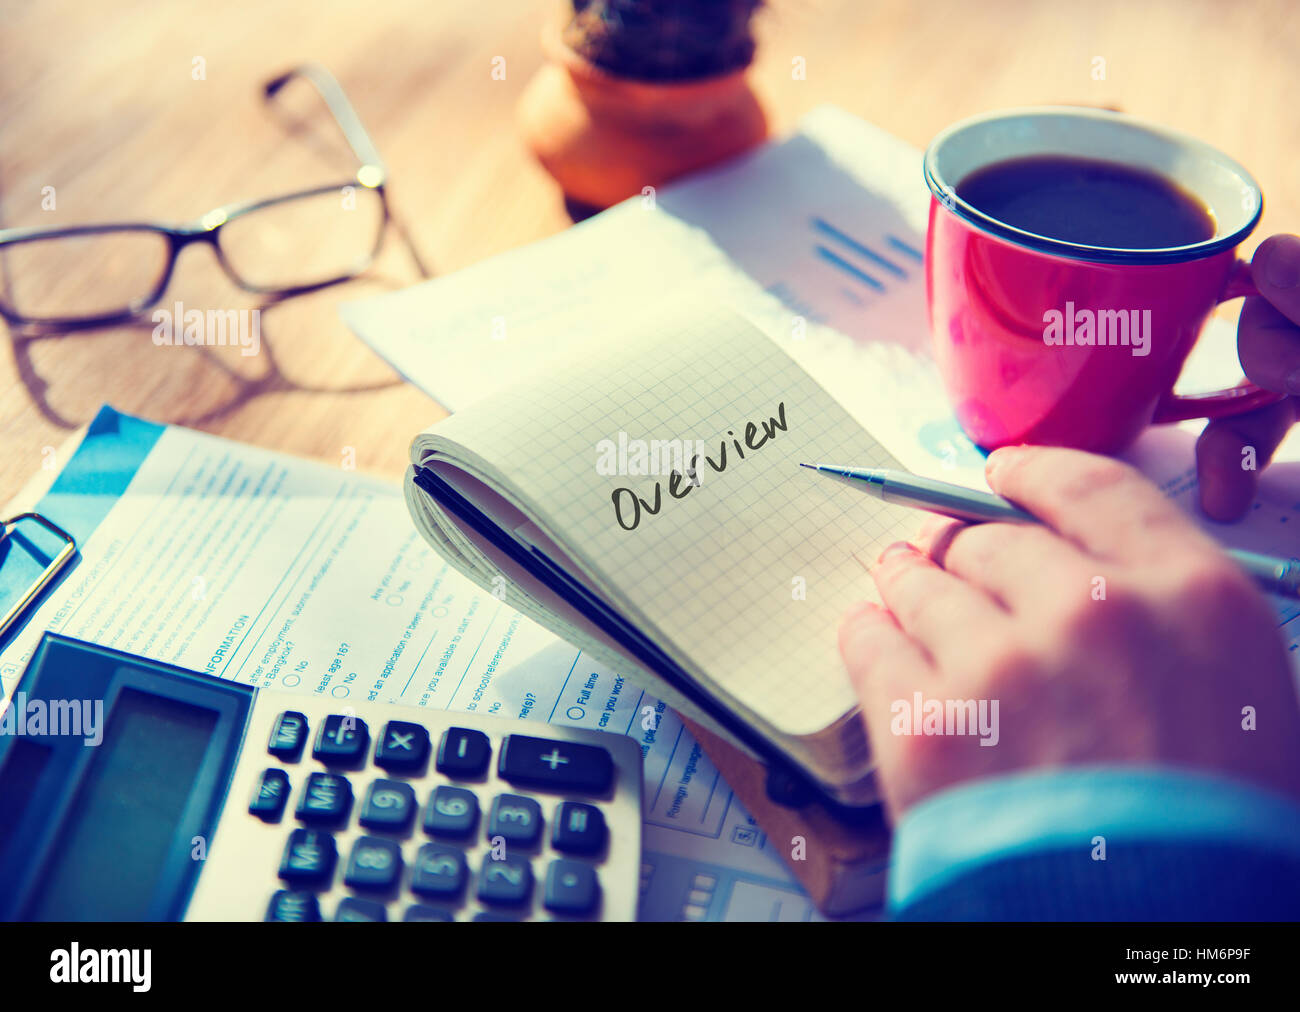 Overview Brief Summary Description Conclusion Concept - Stock Image